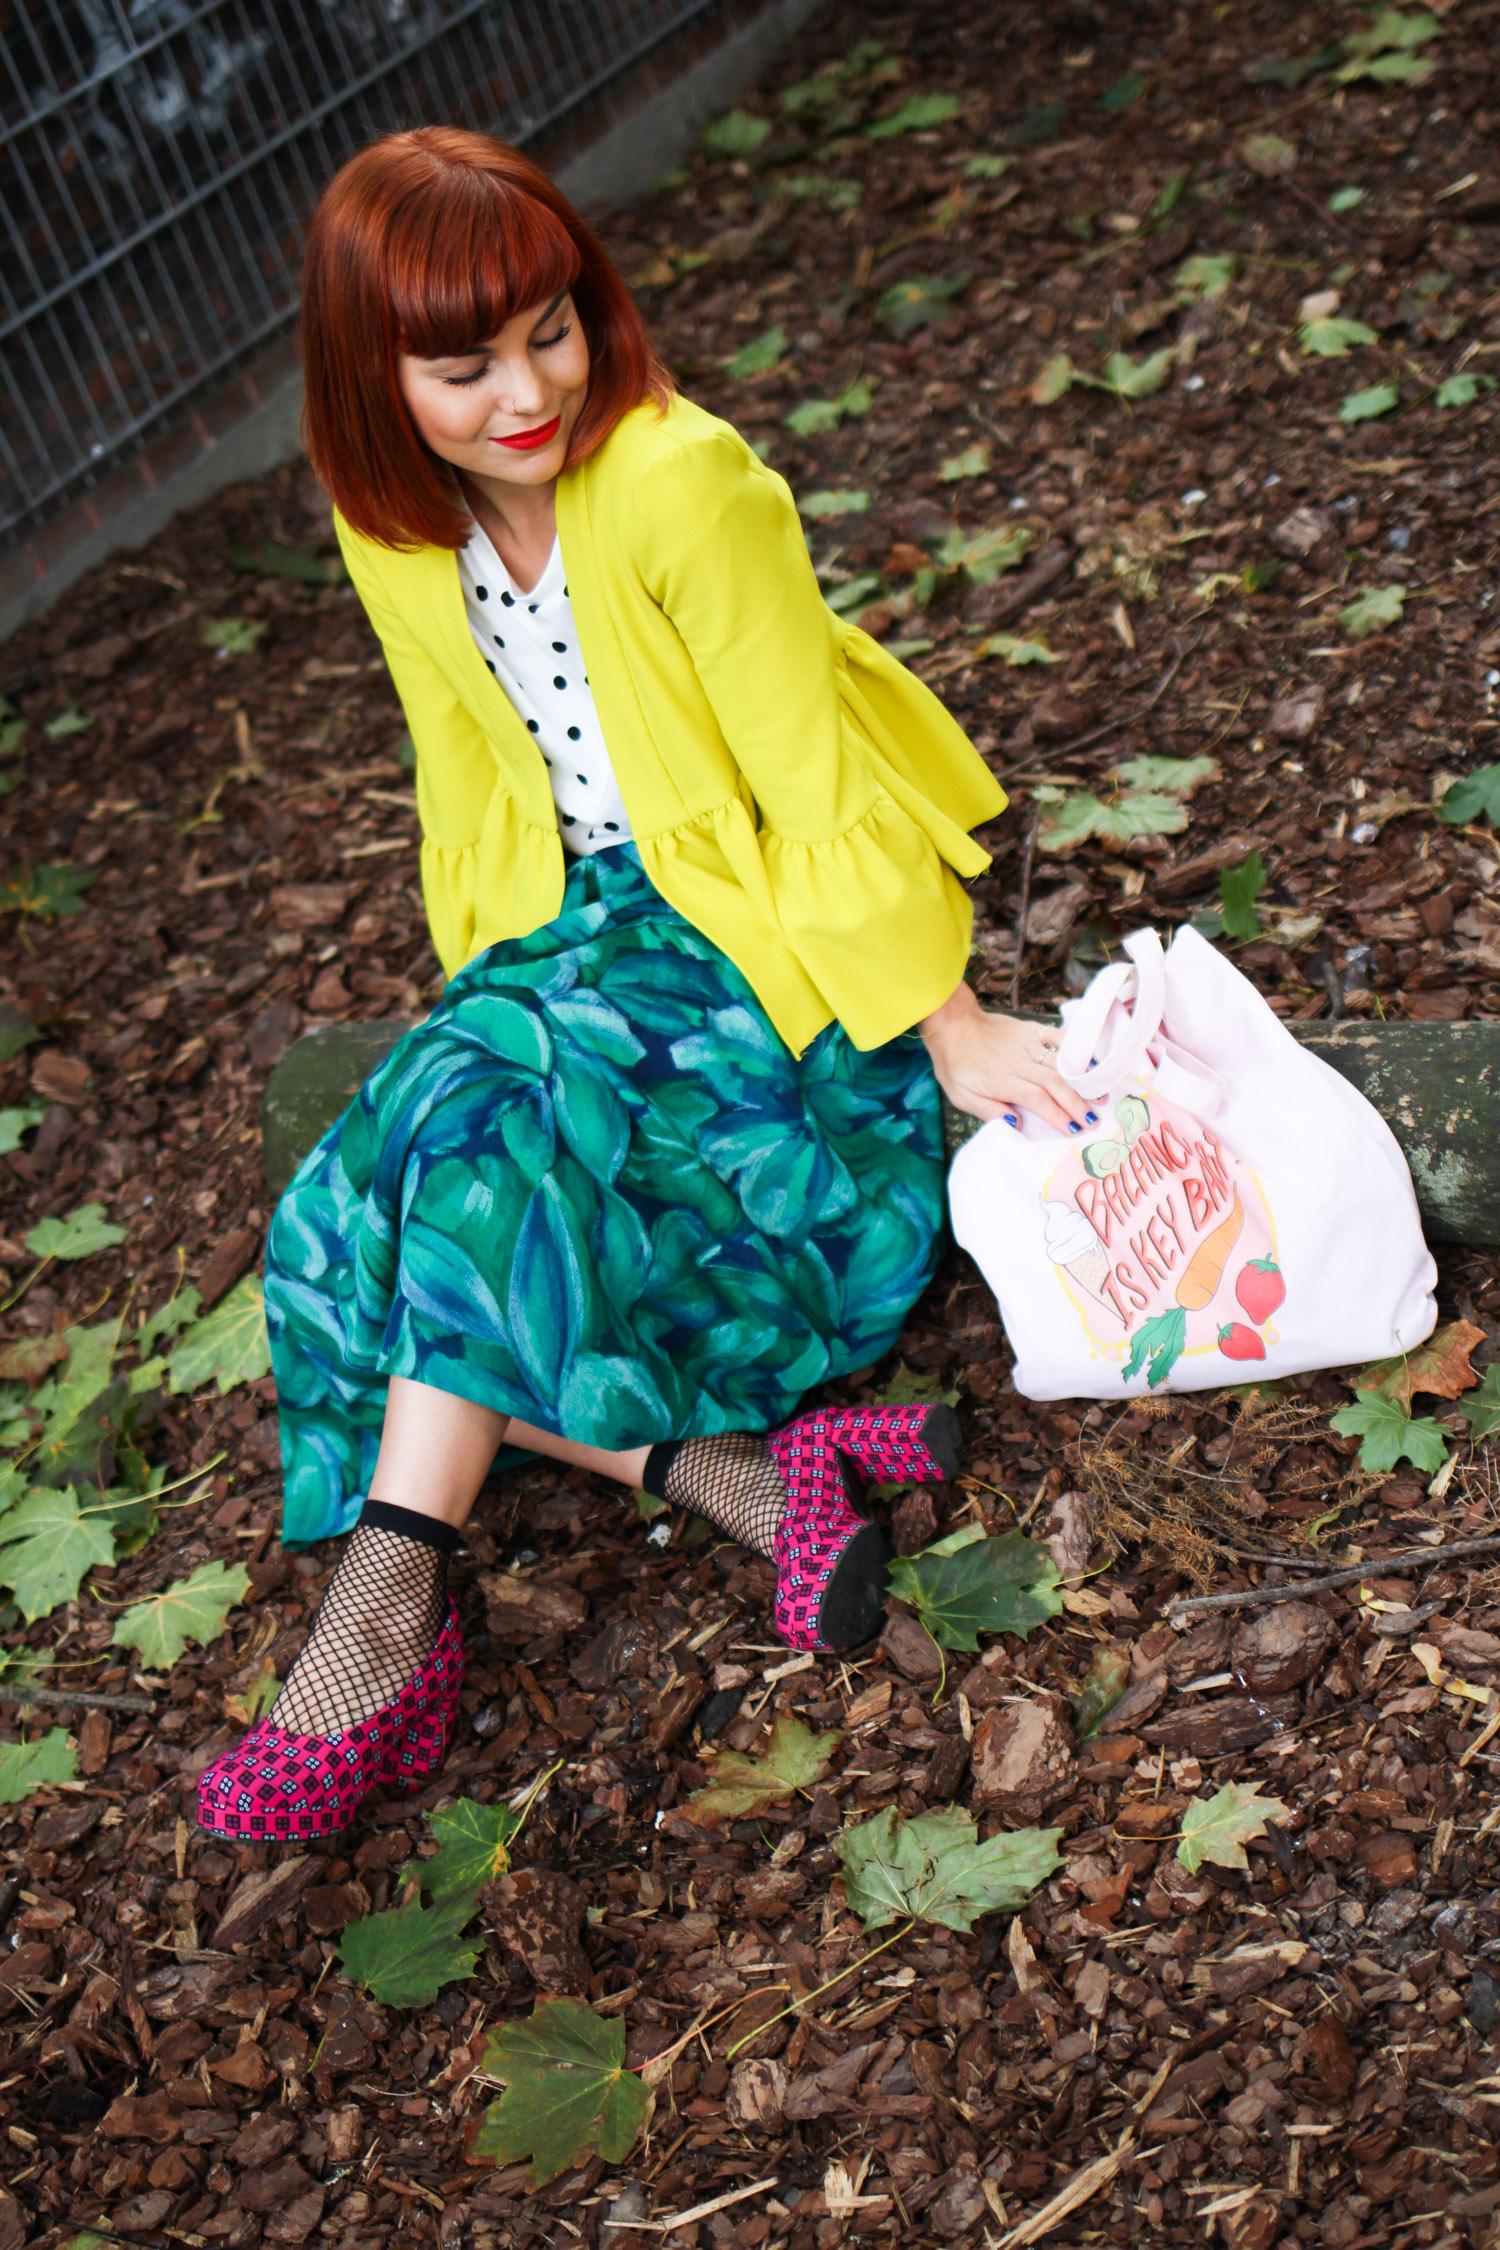 MyRainbowFeeling_Blogfotos_Mathilde-27